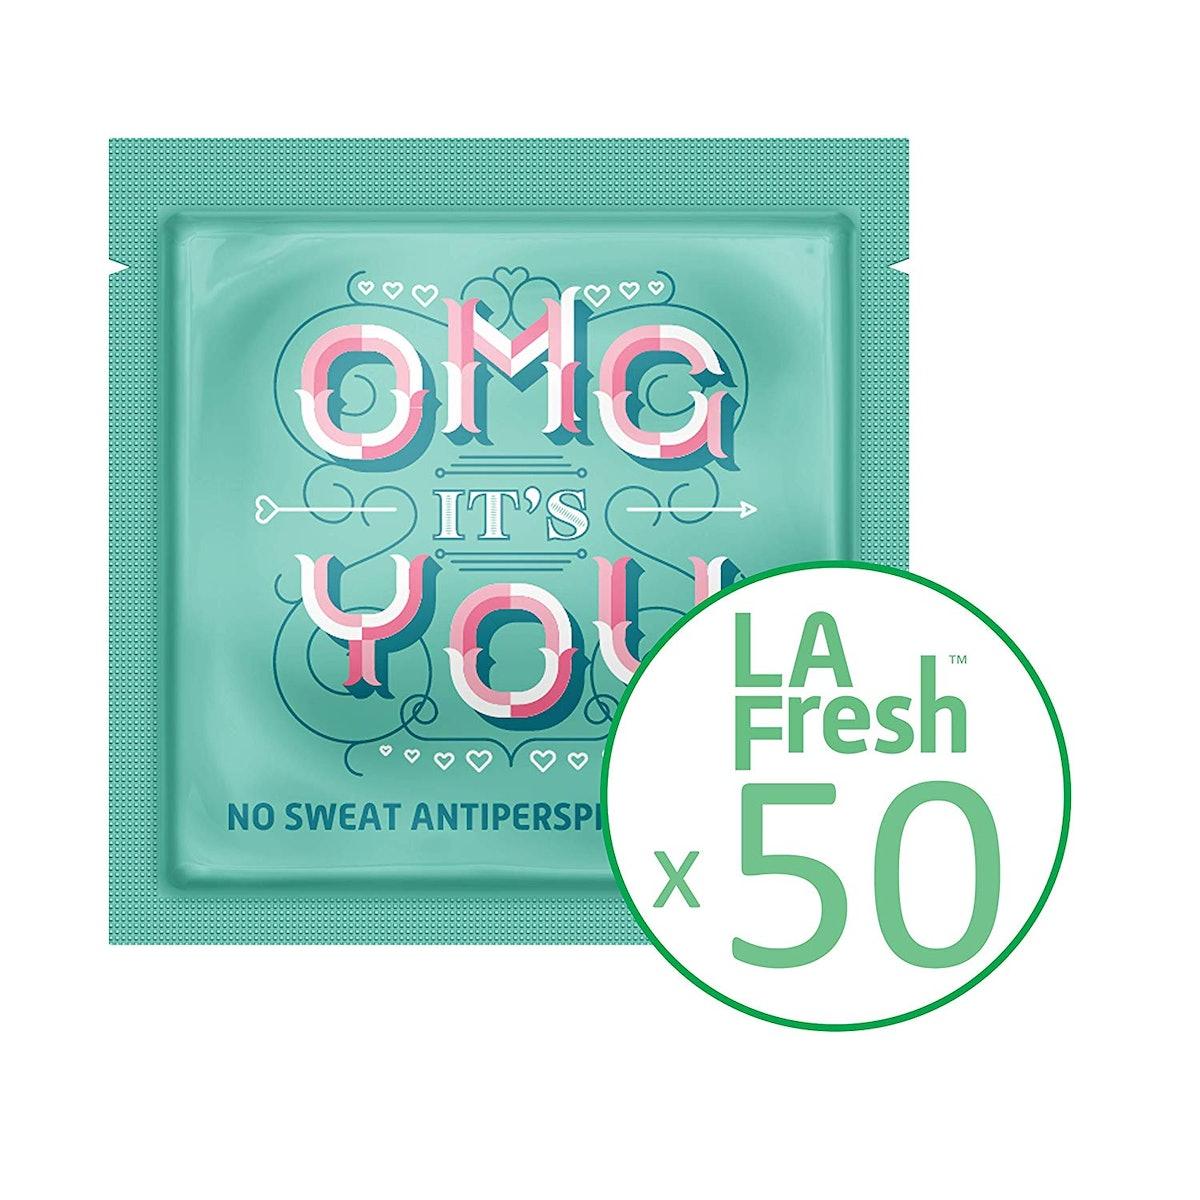 La Fresh Antiperspirant Wipes